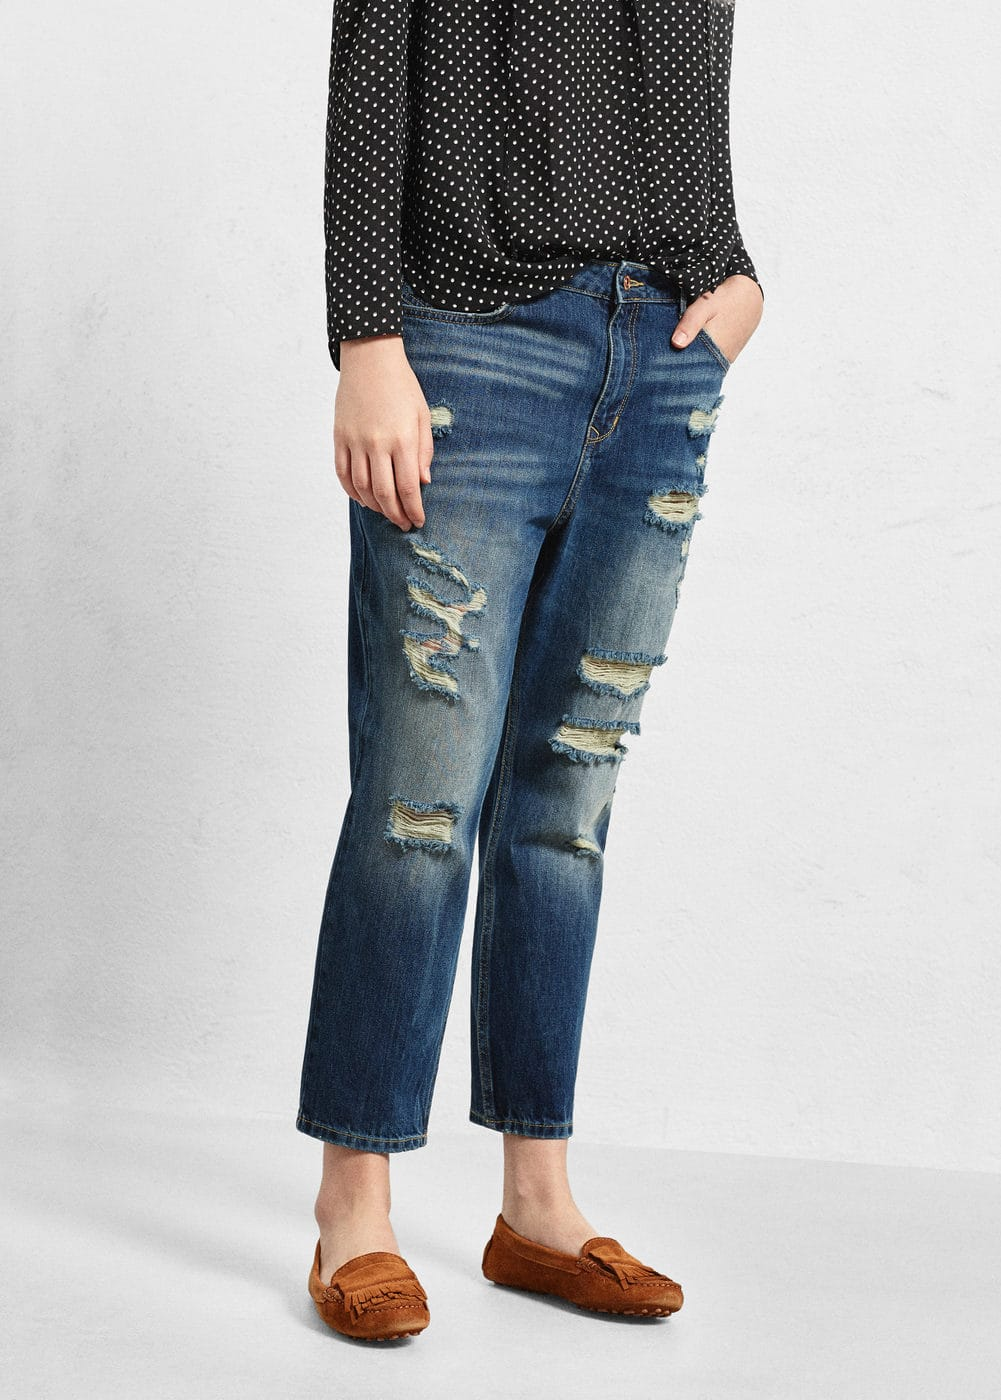 boyfriend jeans claudia jeans gro e gr en outlet. Black Bedroom Furniture Sets. Home Design Ideas